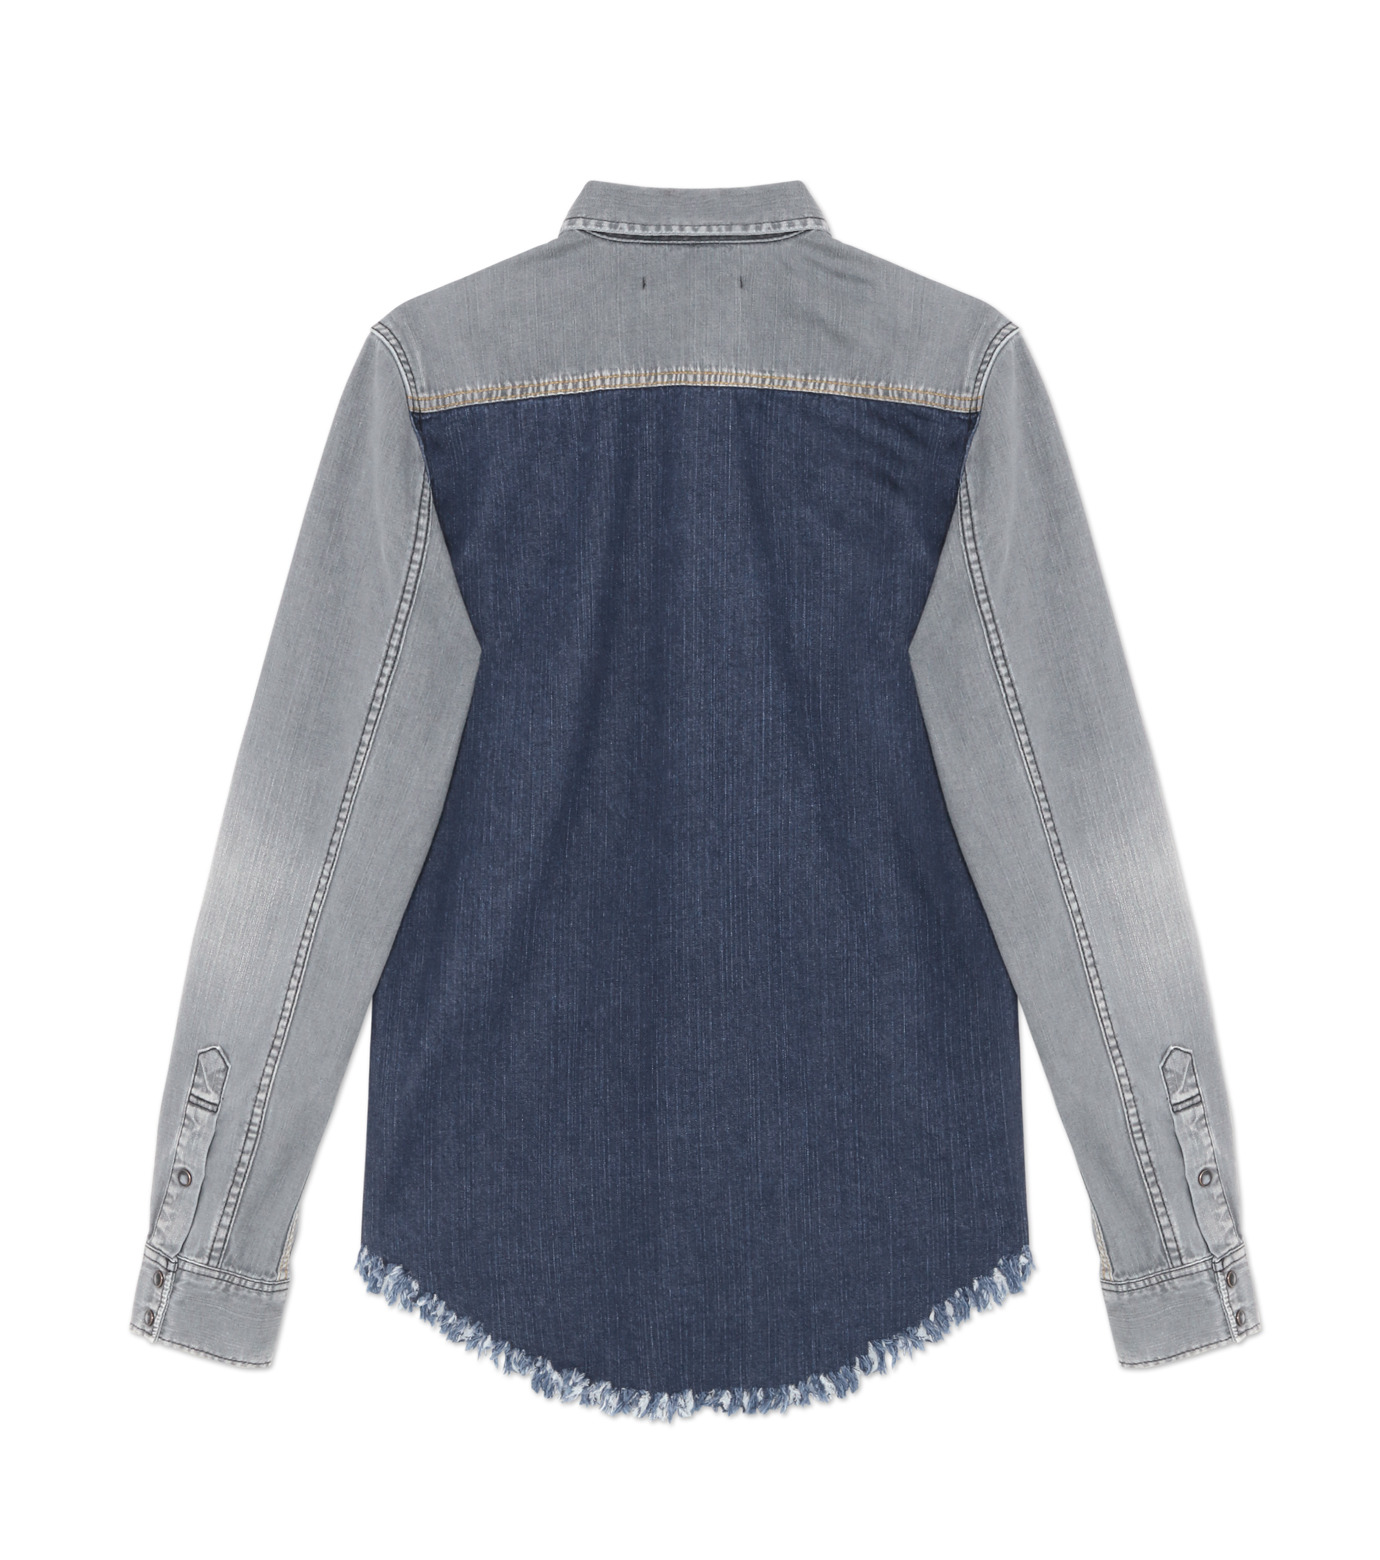 HL HEDDIE LOVU(エイチエル・エディールーヴ)のBK DENIM WASH SHIRT-GRAY(シャツ/shirt)-18S93004-11 拡大詳細画像2